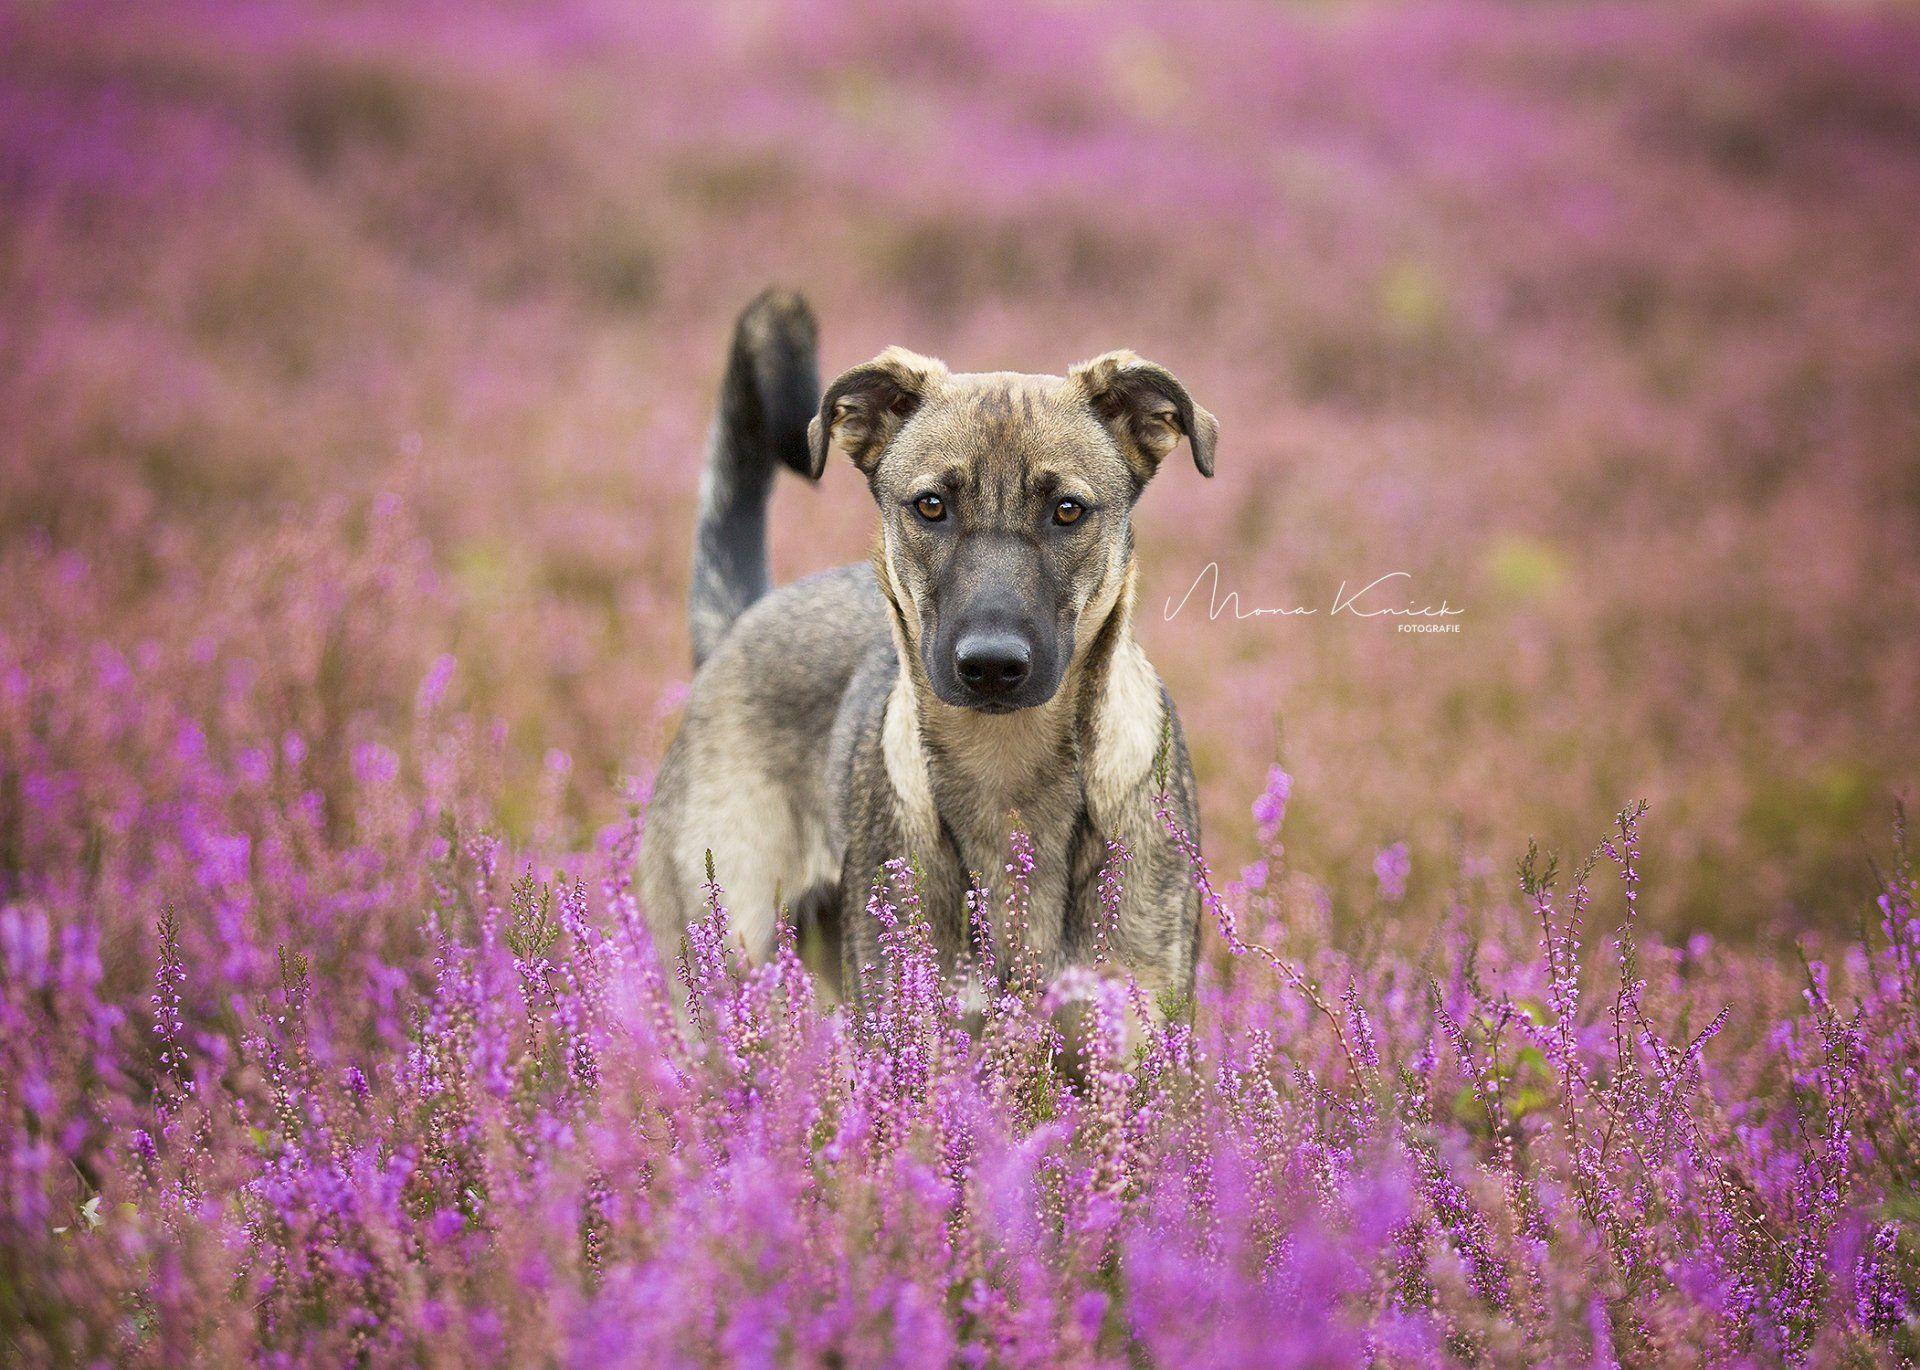 Pin Auf Hundefotografie Mona Knick Fotografie